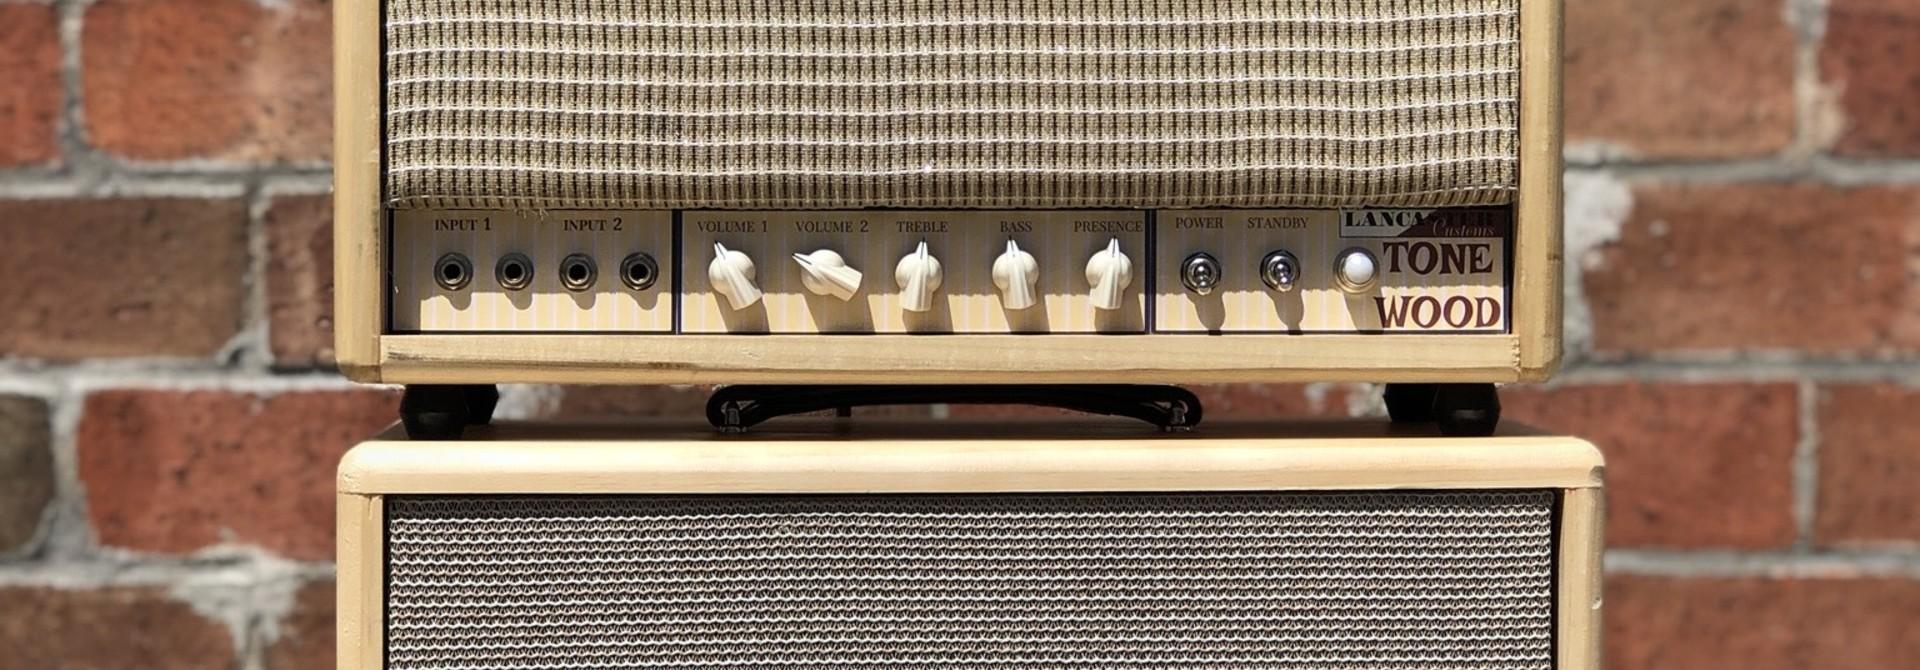 Lancaster Customs Tone Wood Head and 1x12 Cab